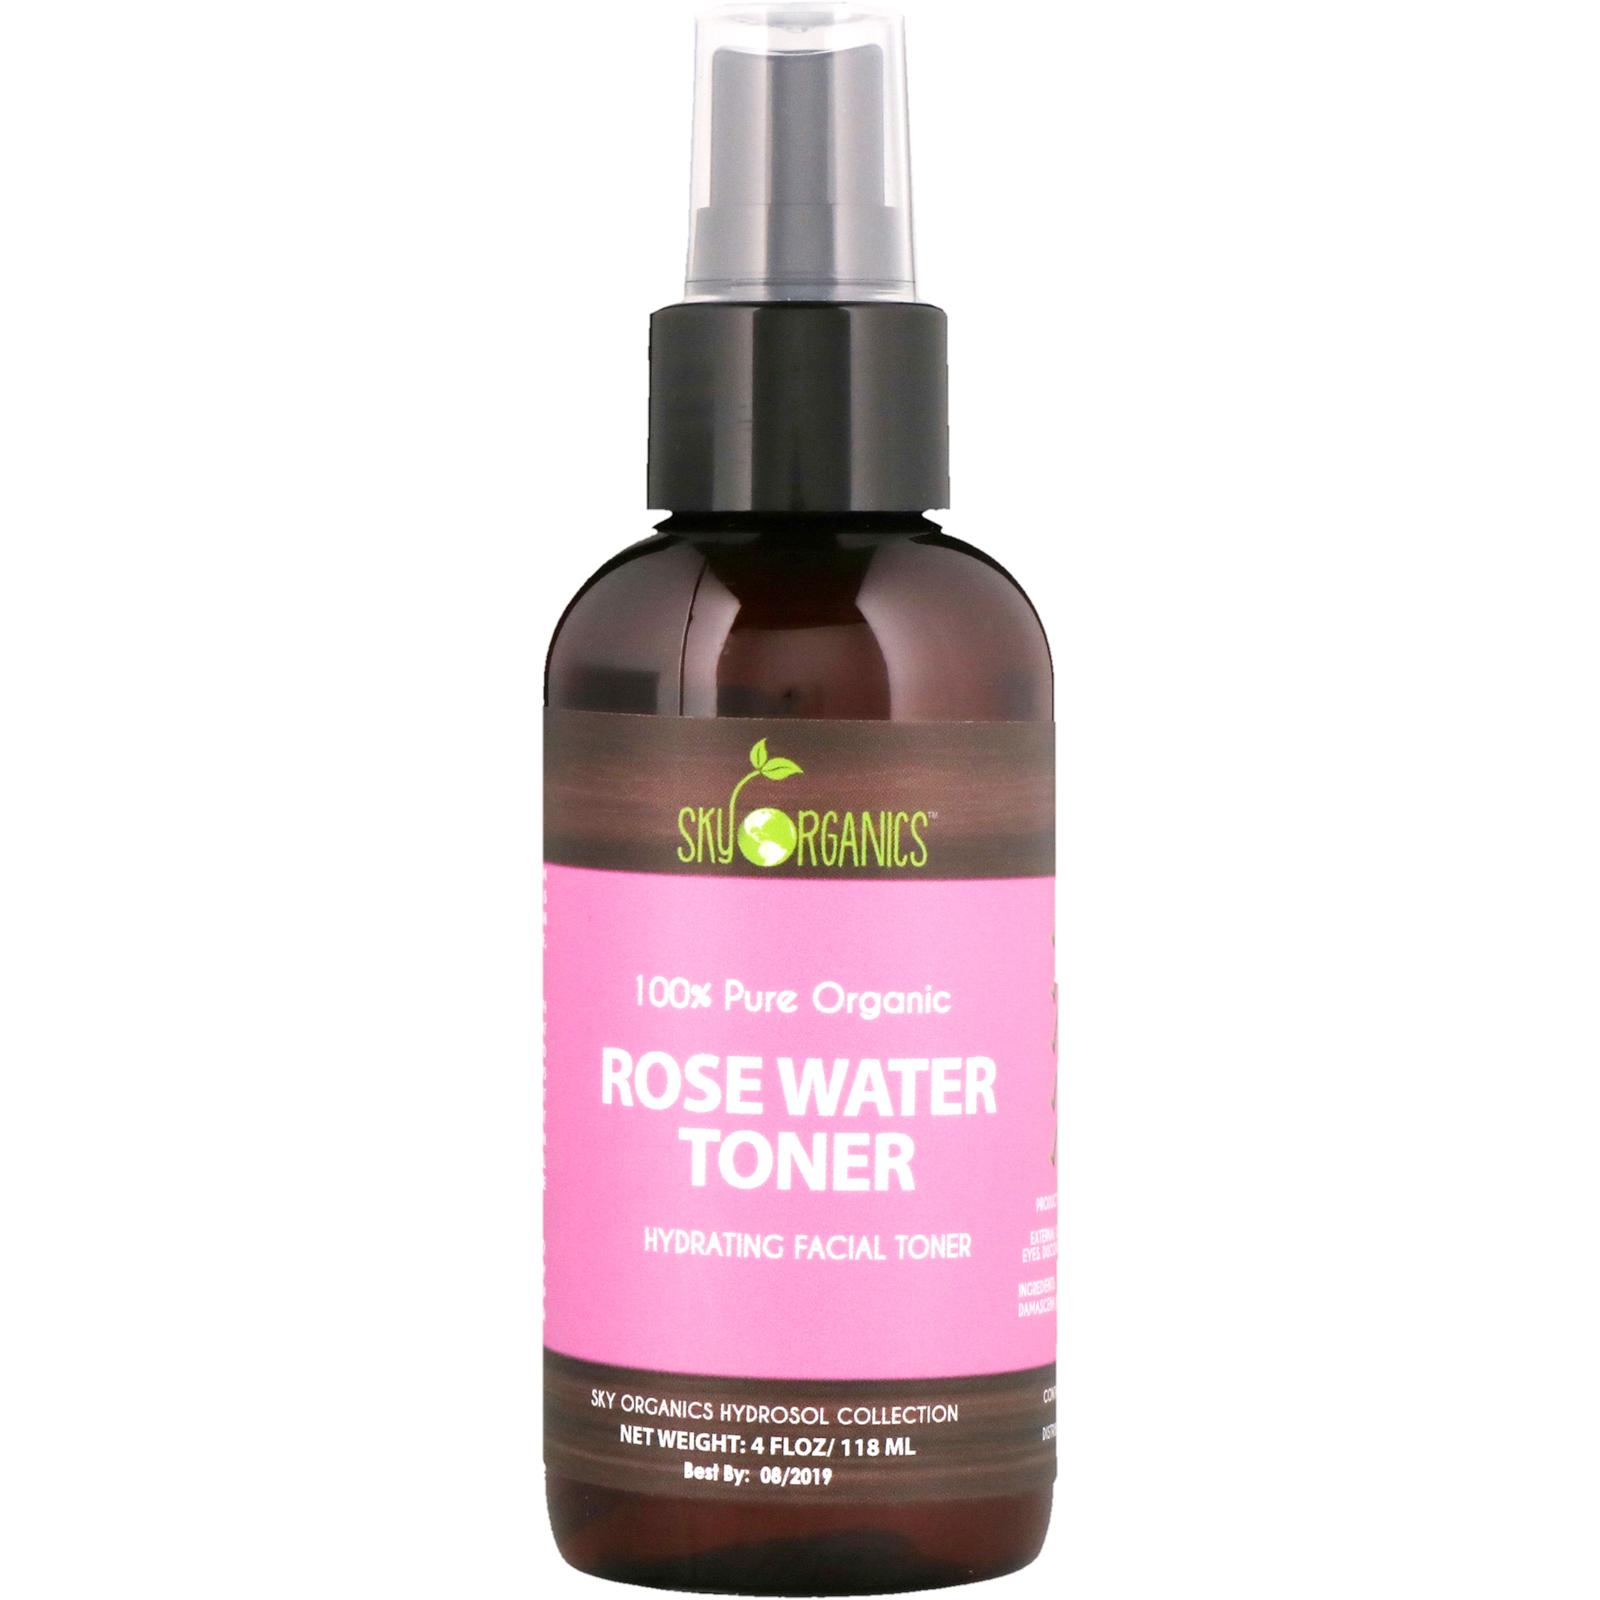 Sky Organics 100 Pure Organic Rose Water Toner 4 Fl Oz 118 Ml Humphrey Skin Care Activated Charcoal Bodywash 500ml